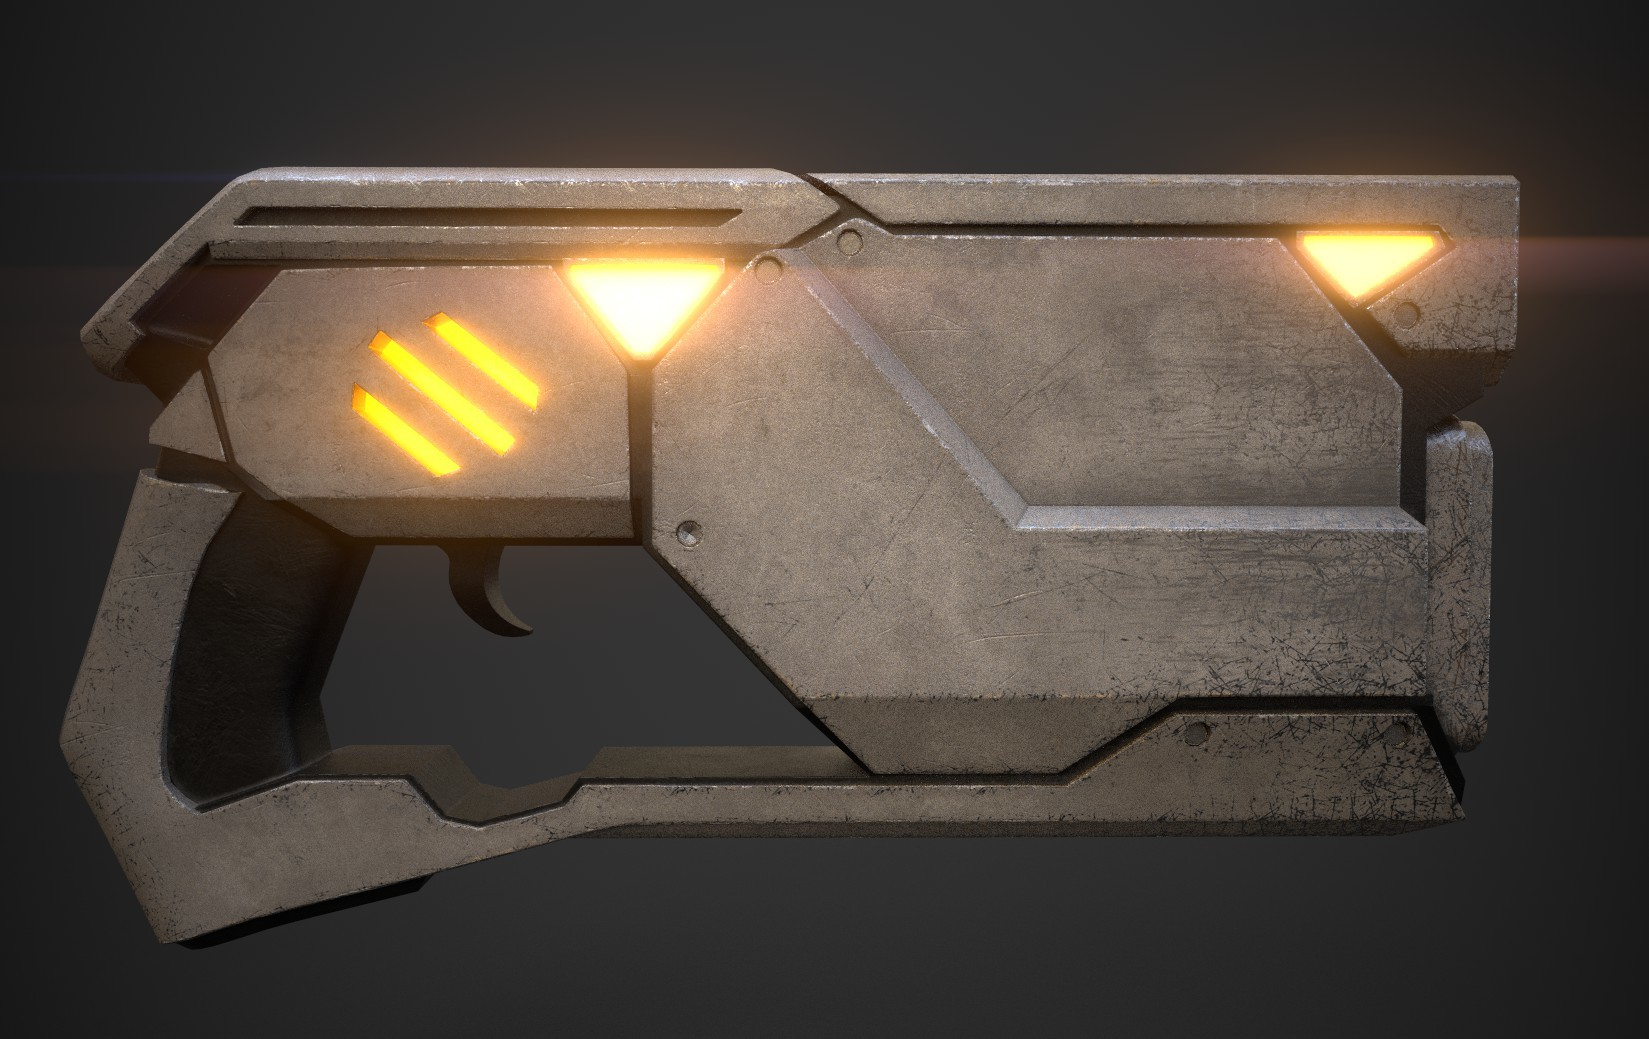 Kevin gillis nagy gun concept new 02